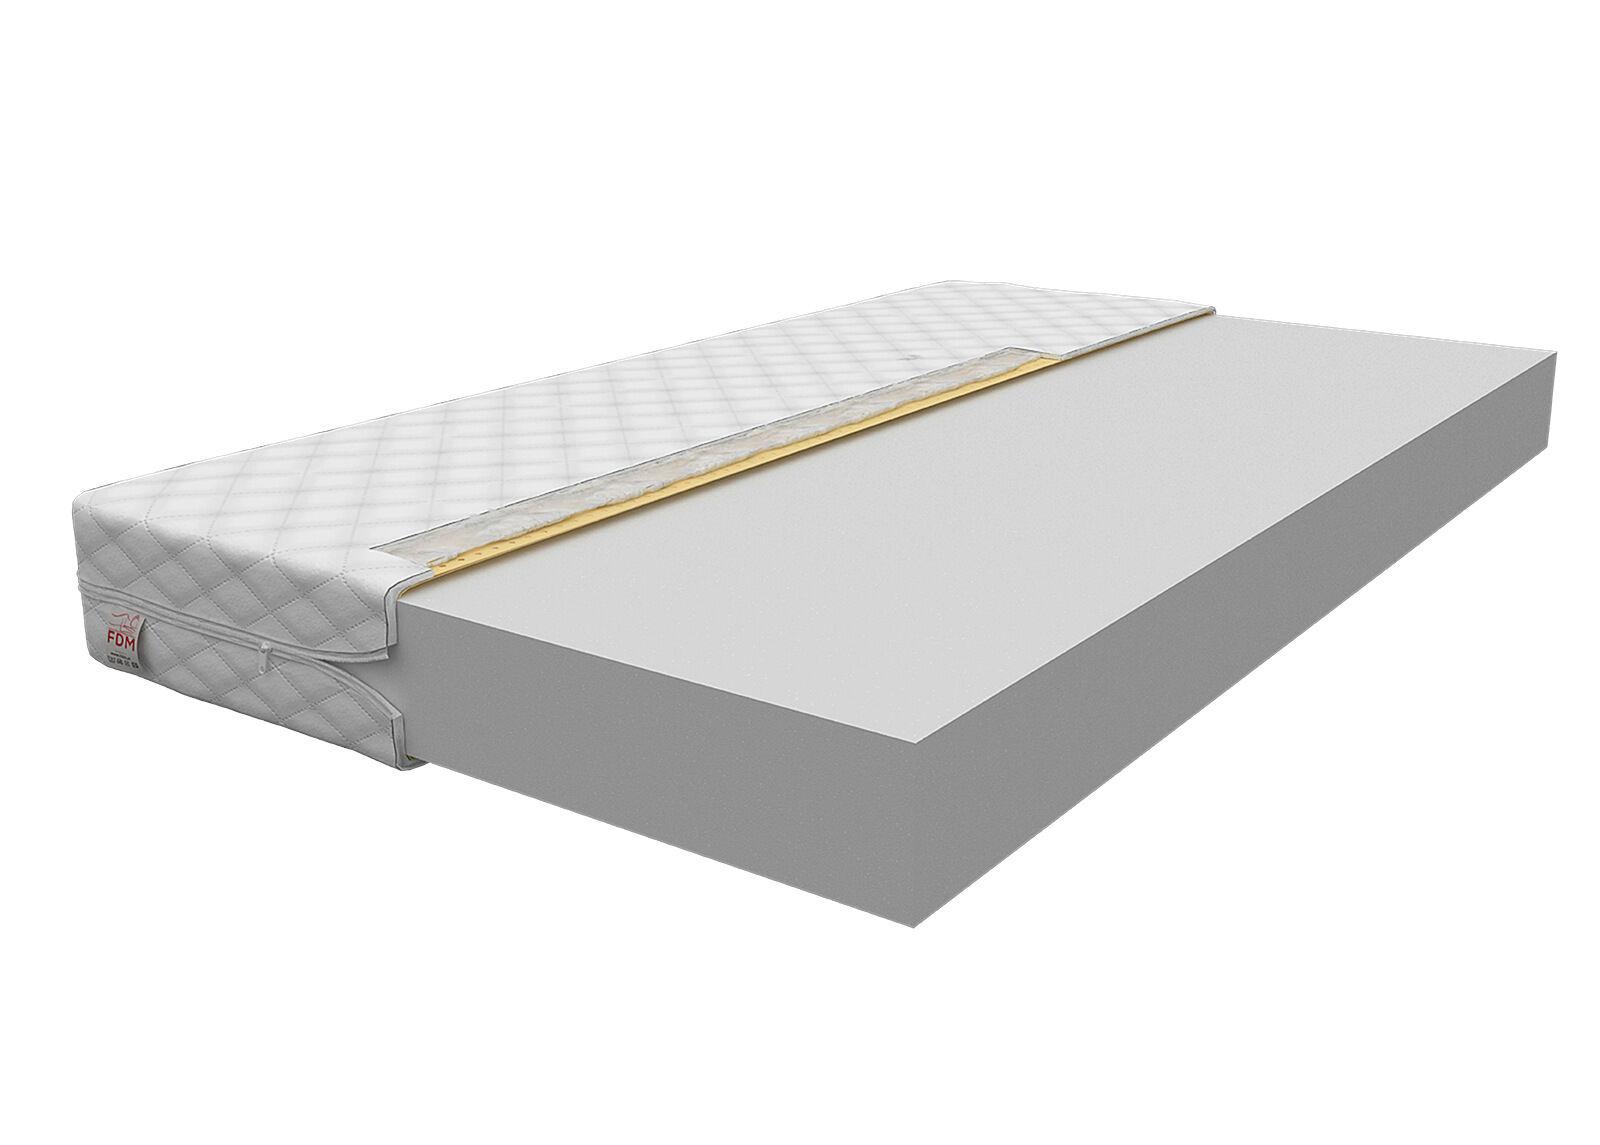 FDM Vaahtomuovipatja Bresso T25 160x200 cm